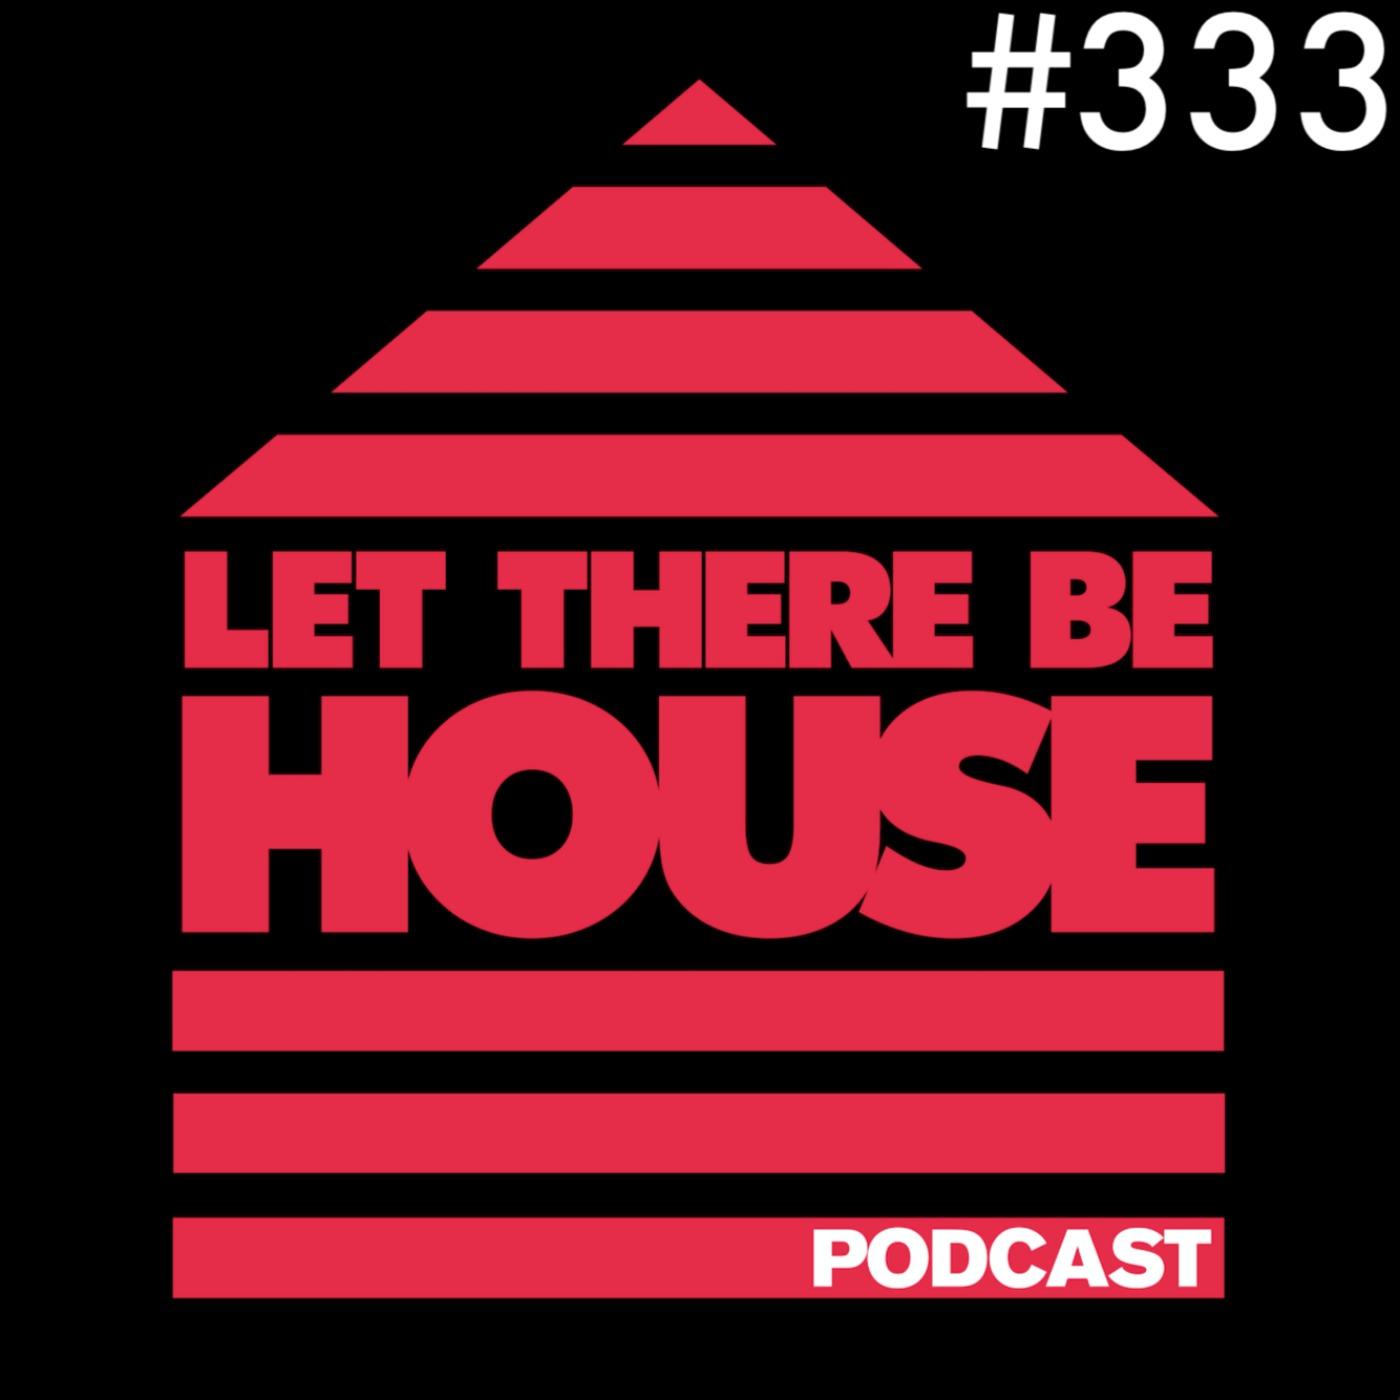 LTBH #333 with Glen Horsborough